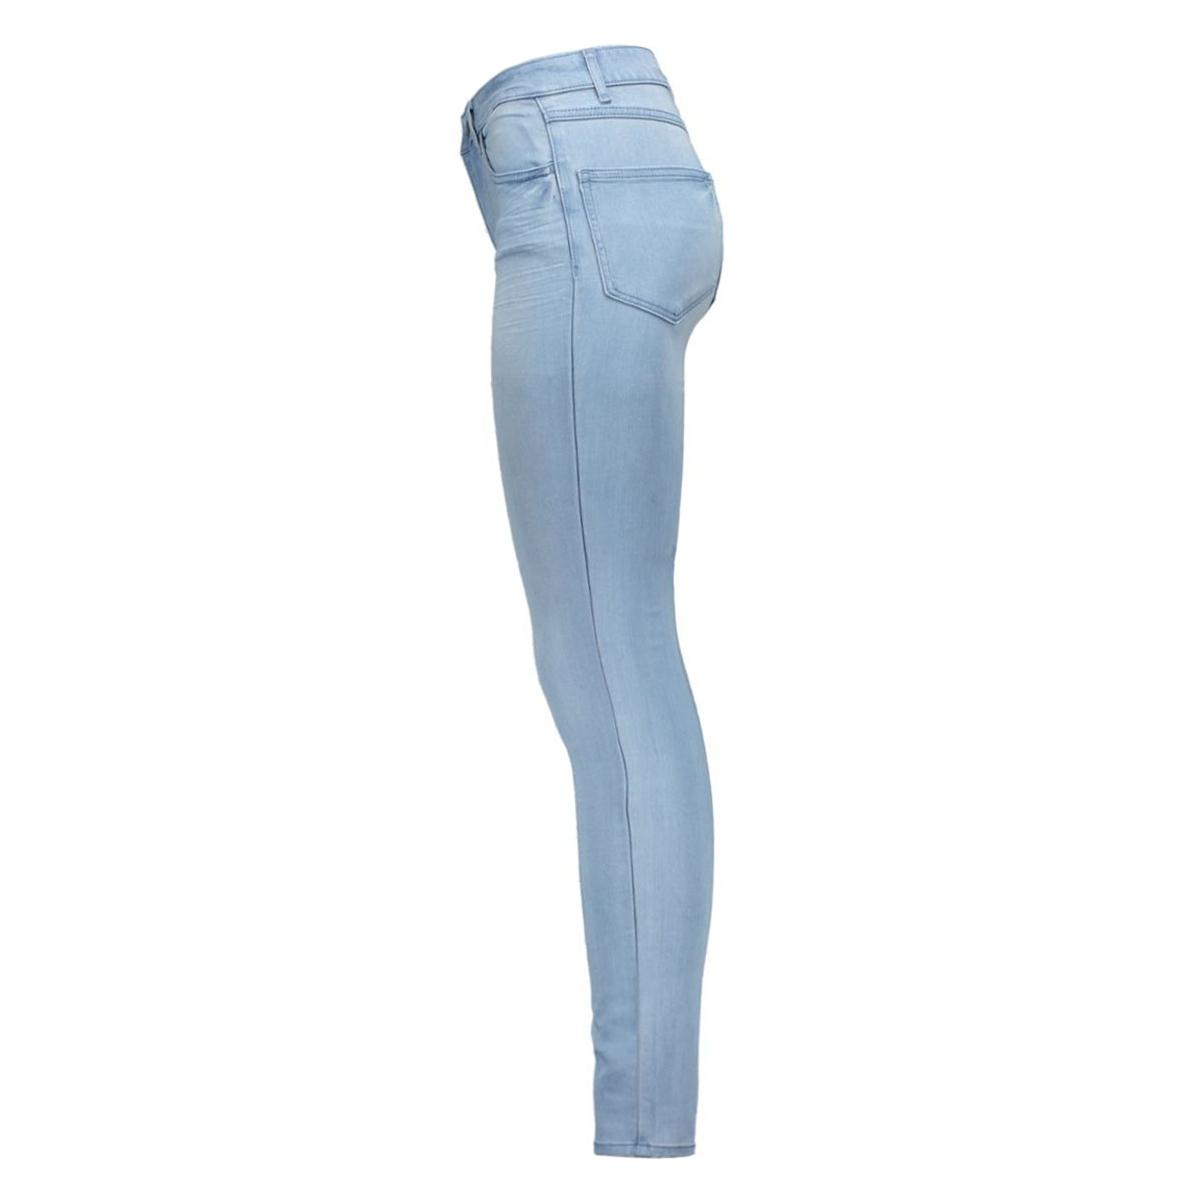 vicommit rw 5p 14033868 vila jeans light blue denim